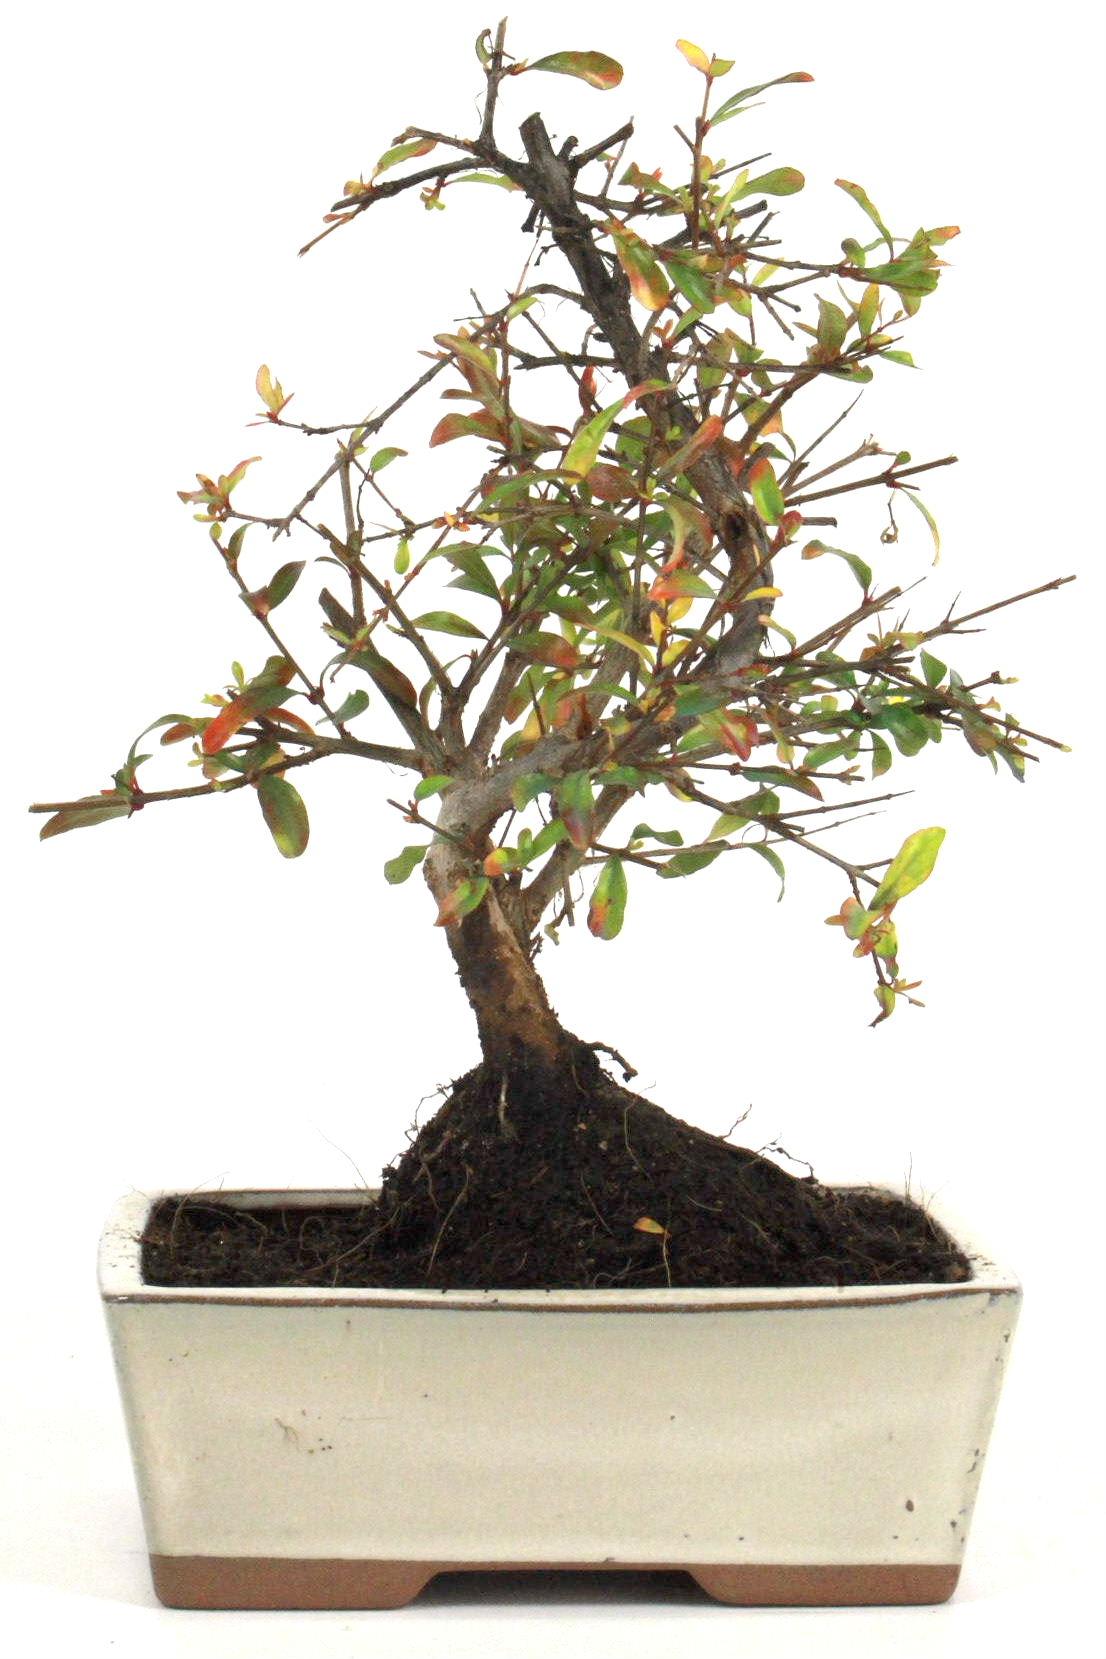 granatapfel bonsai 25 30 cm 1611 bei oyaki bonsai kaufen. Black Bedroom Furniture Sets. Home Design Ideas